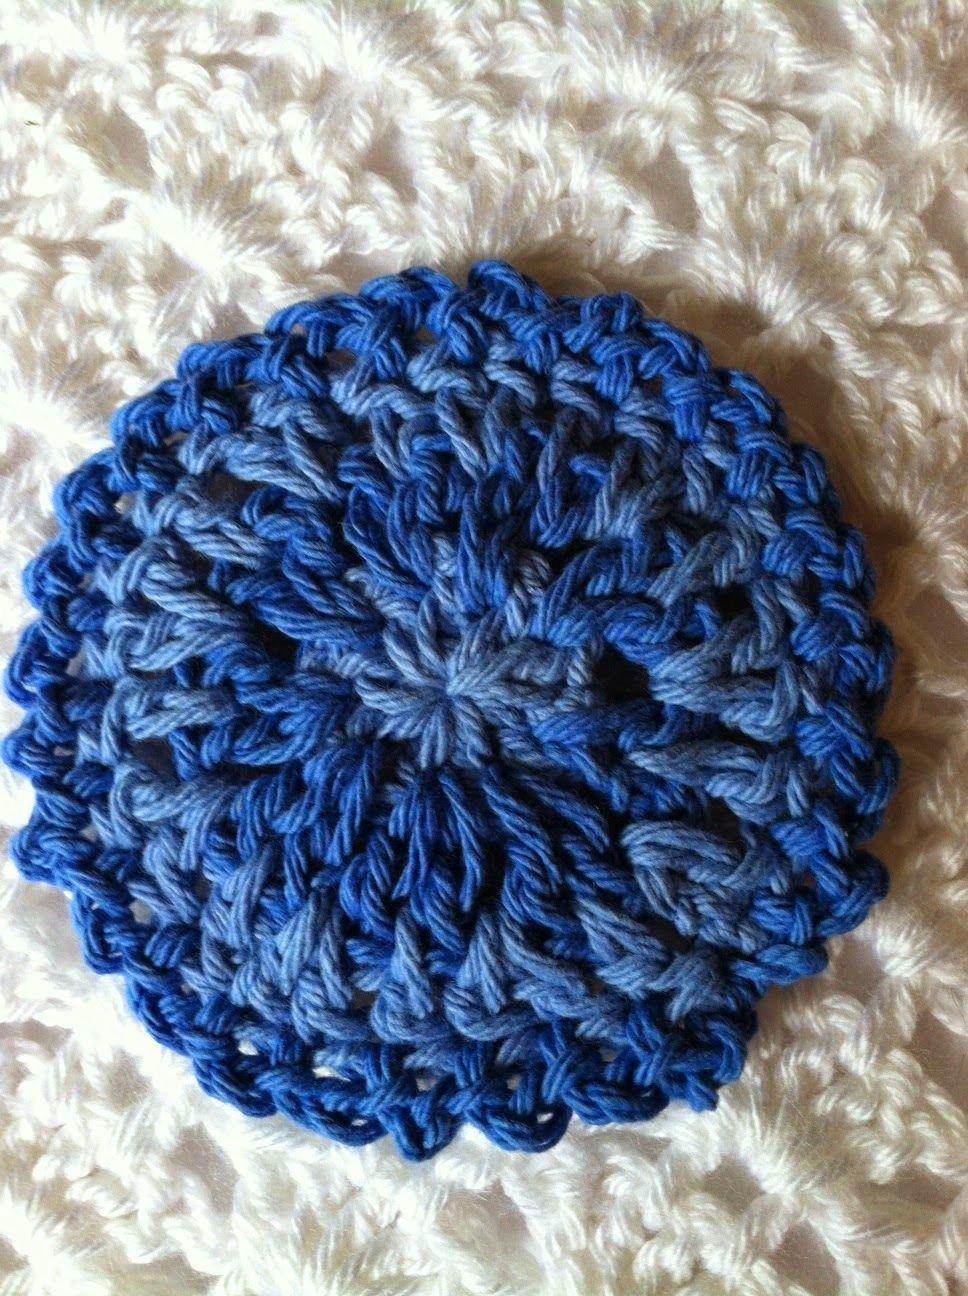 Lakeview Cottage Kids: FREE Crochet Coaster Pattern ...